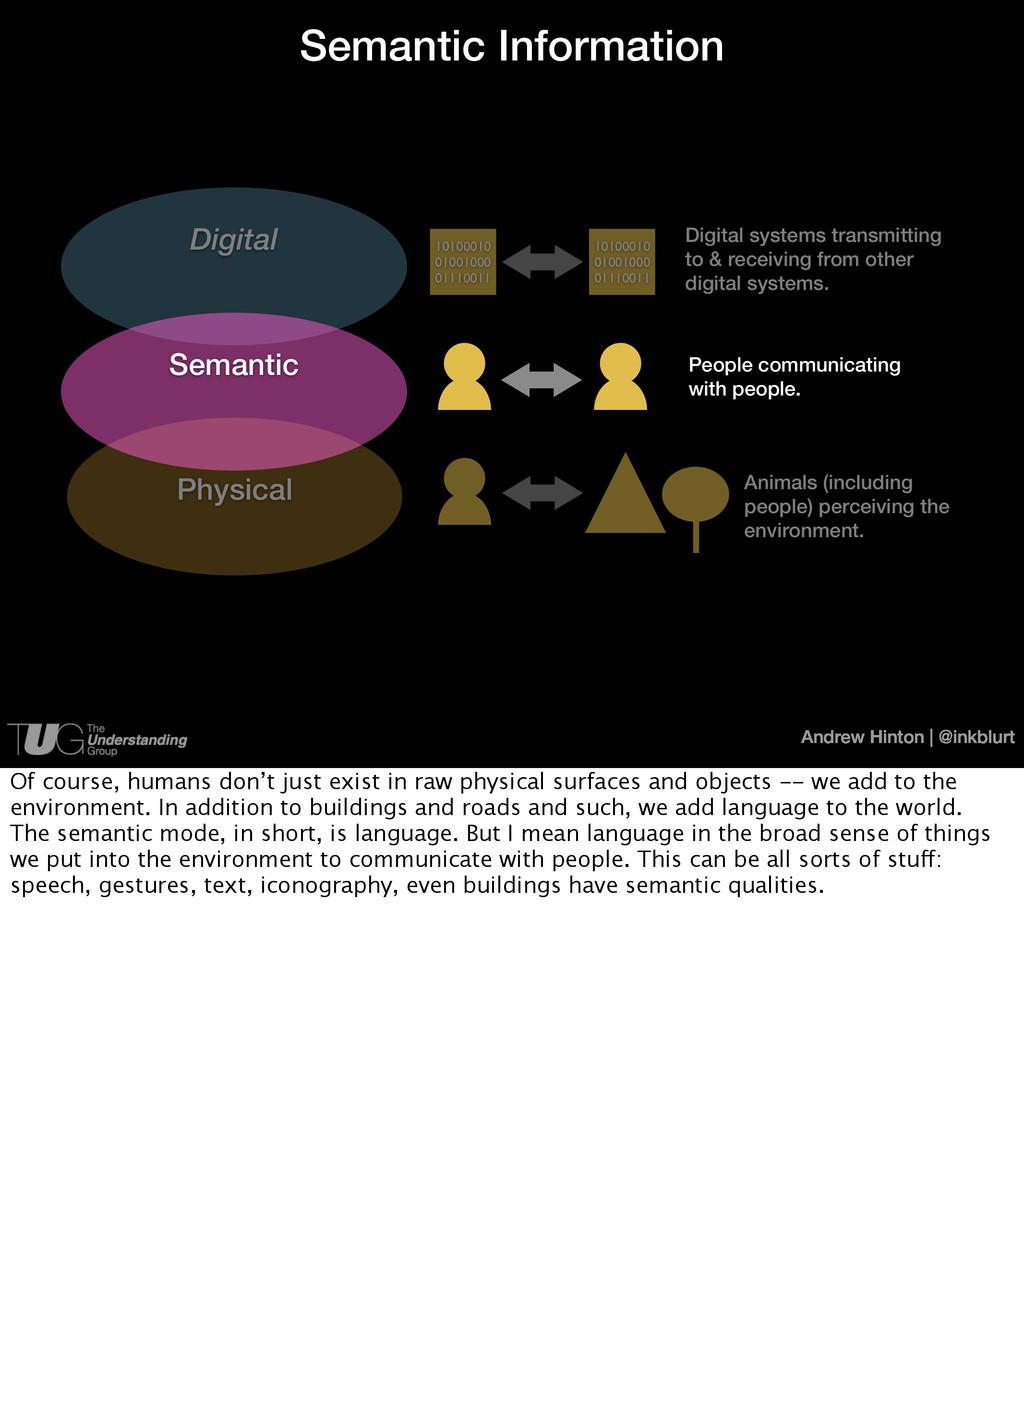 Andrew Hinton   @inkblurt Semantic Information ...